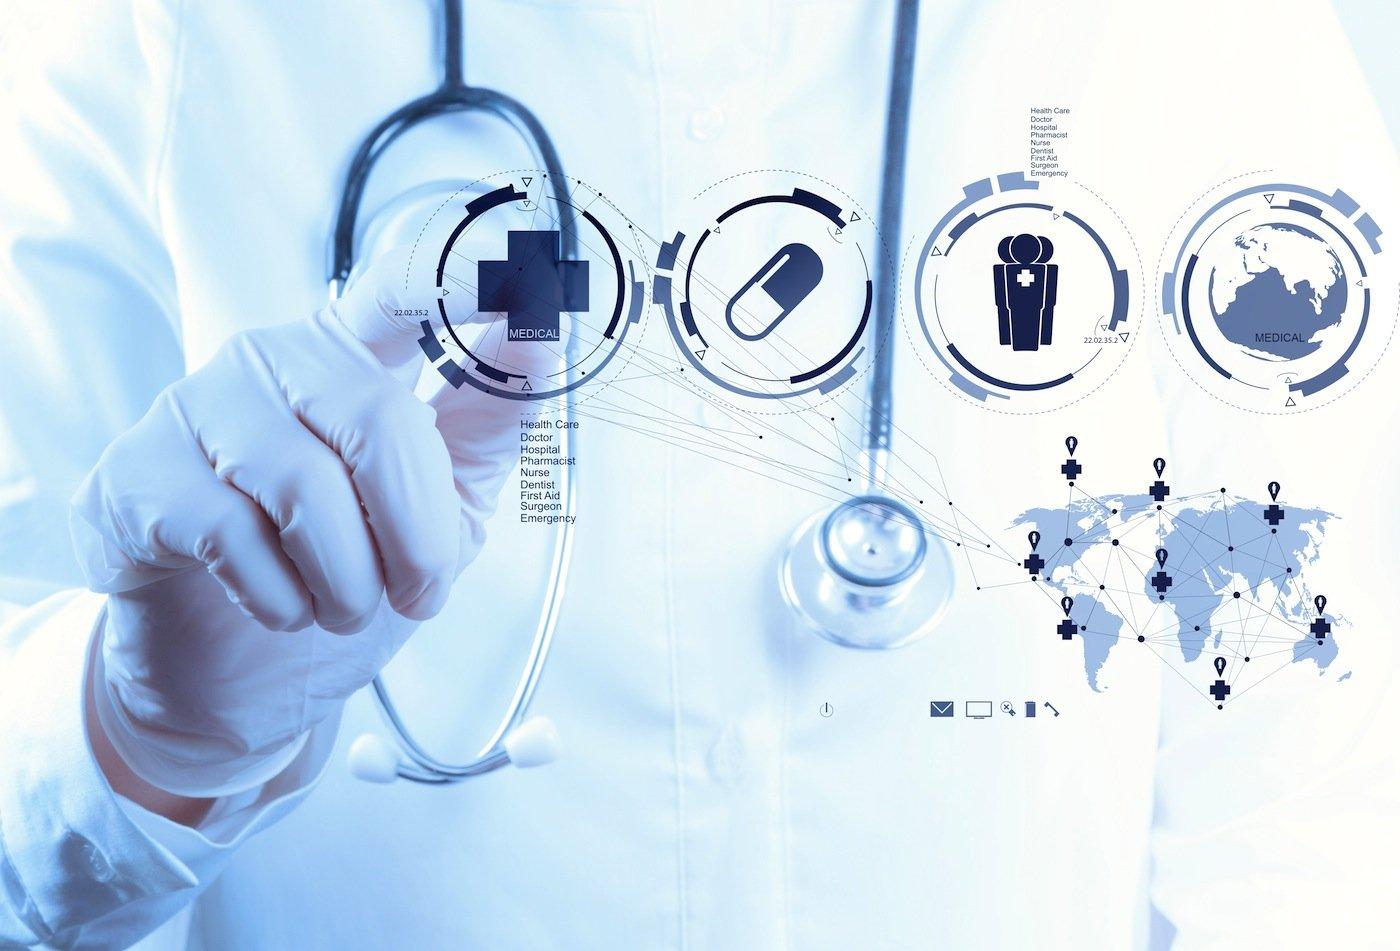 Novartis και Intel: Συστάσεις για βιώσιμα προγράμματα ψηφιακής υγείας